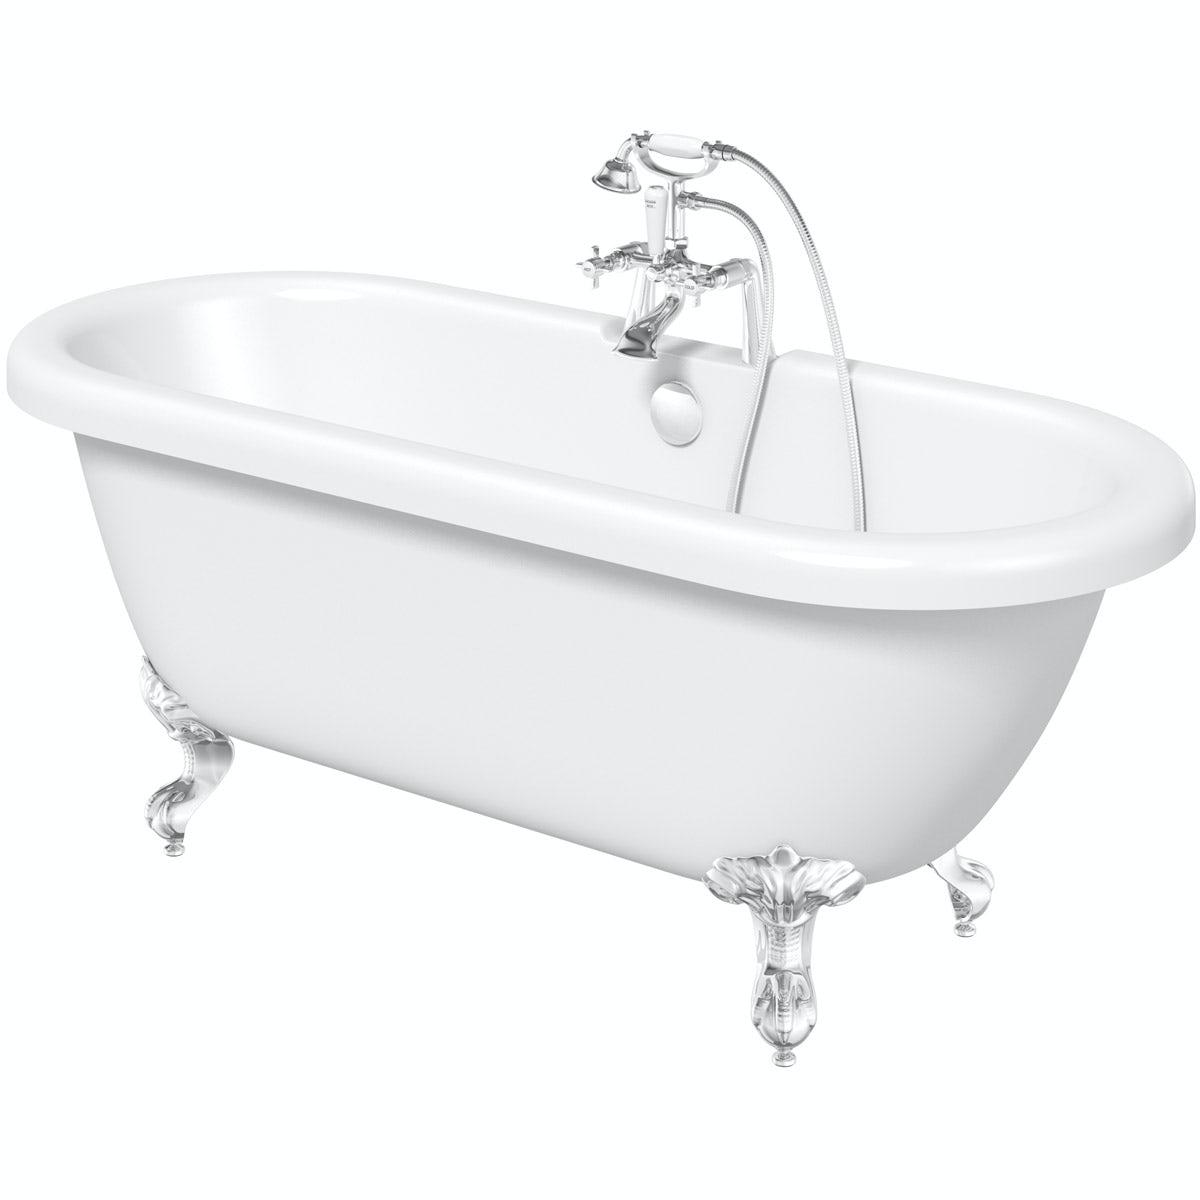 The Bath Co. Dulwich roll top bath with ball and claw feet 1705 x 745